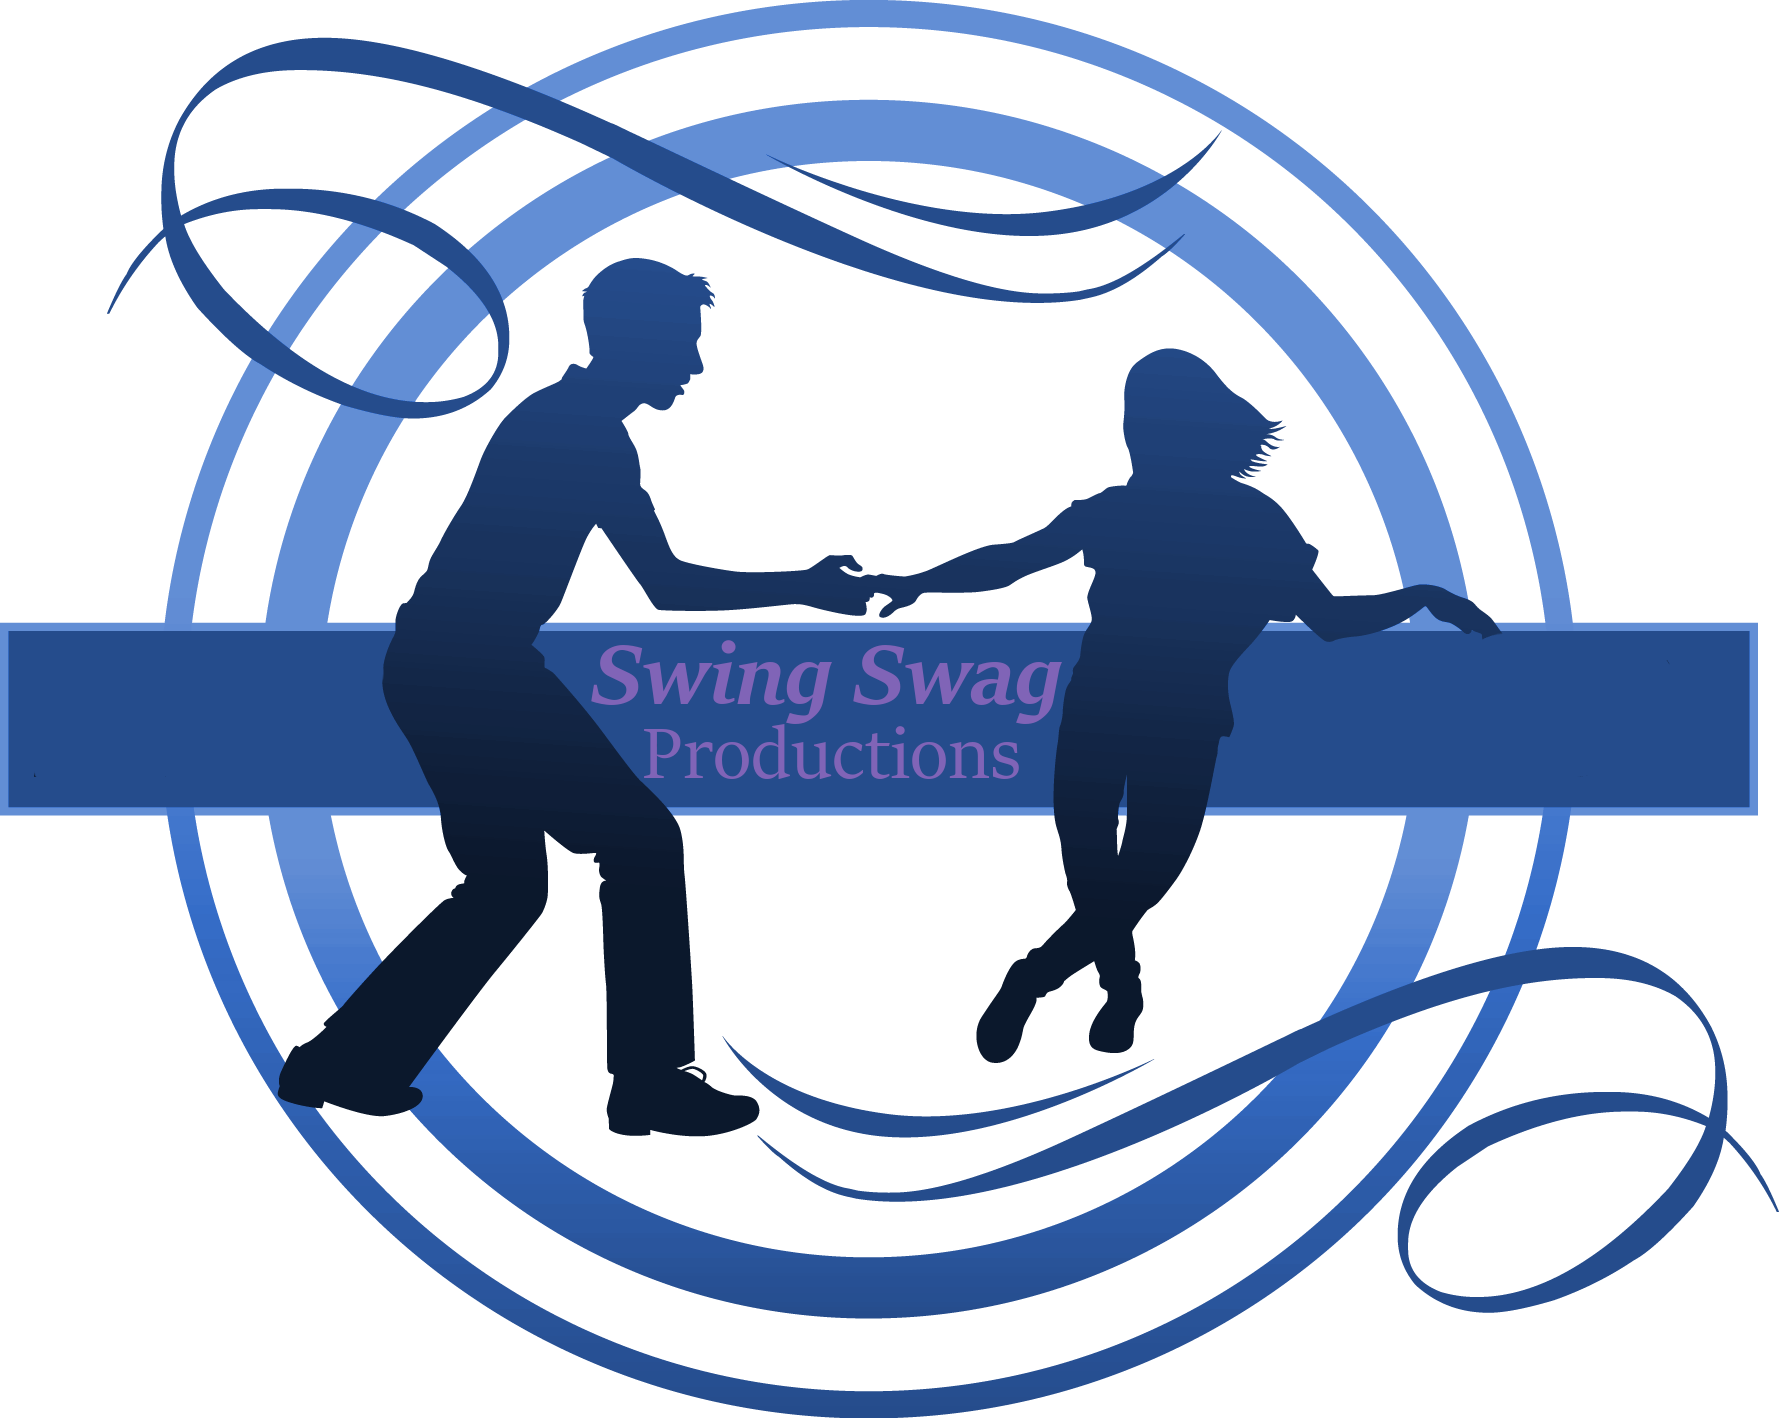 Swing Swag